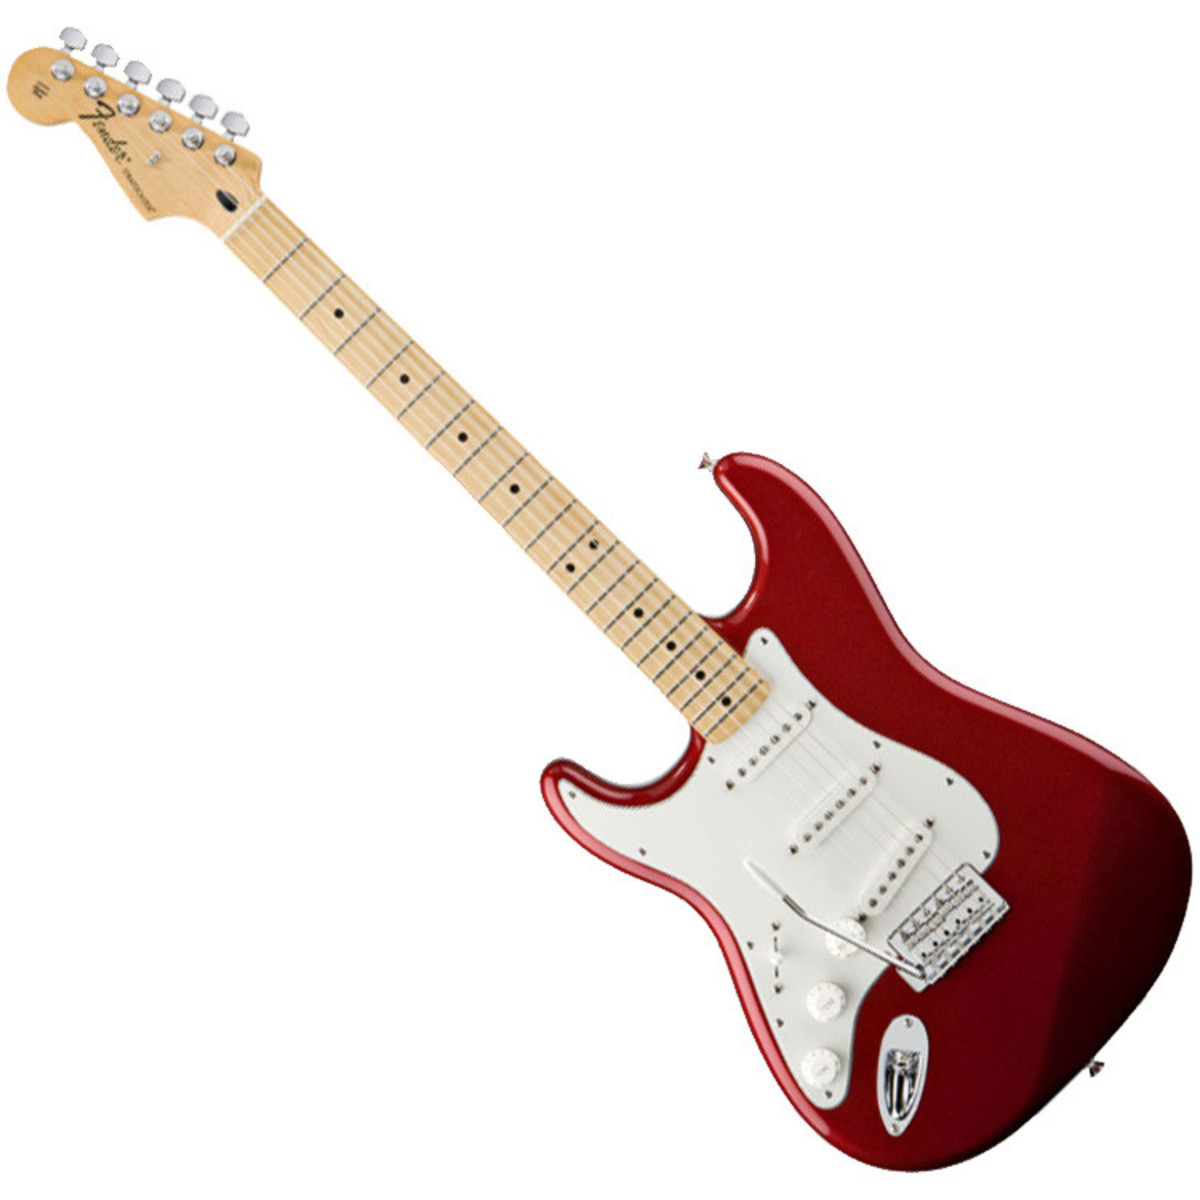 fender standard stratocaster lh electric guitar mn candy apple red at. Black Bedroom Furniture Sets. Home Design Ideas